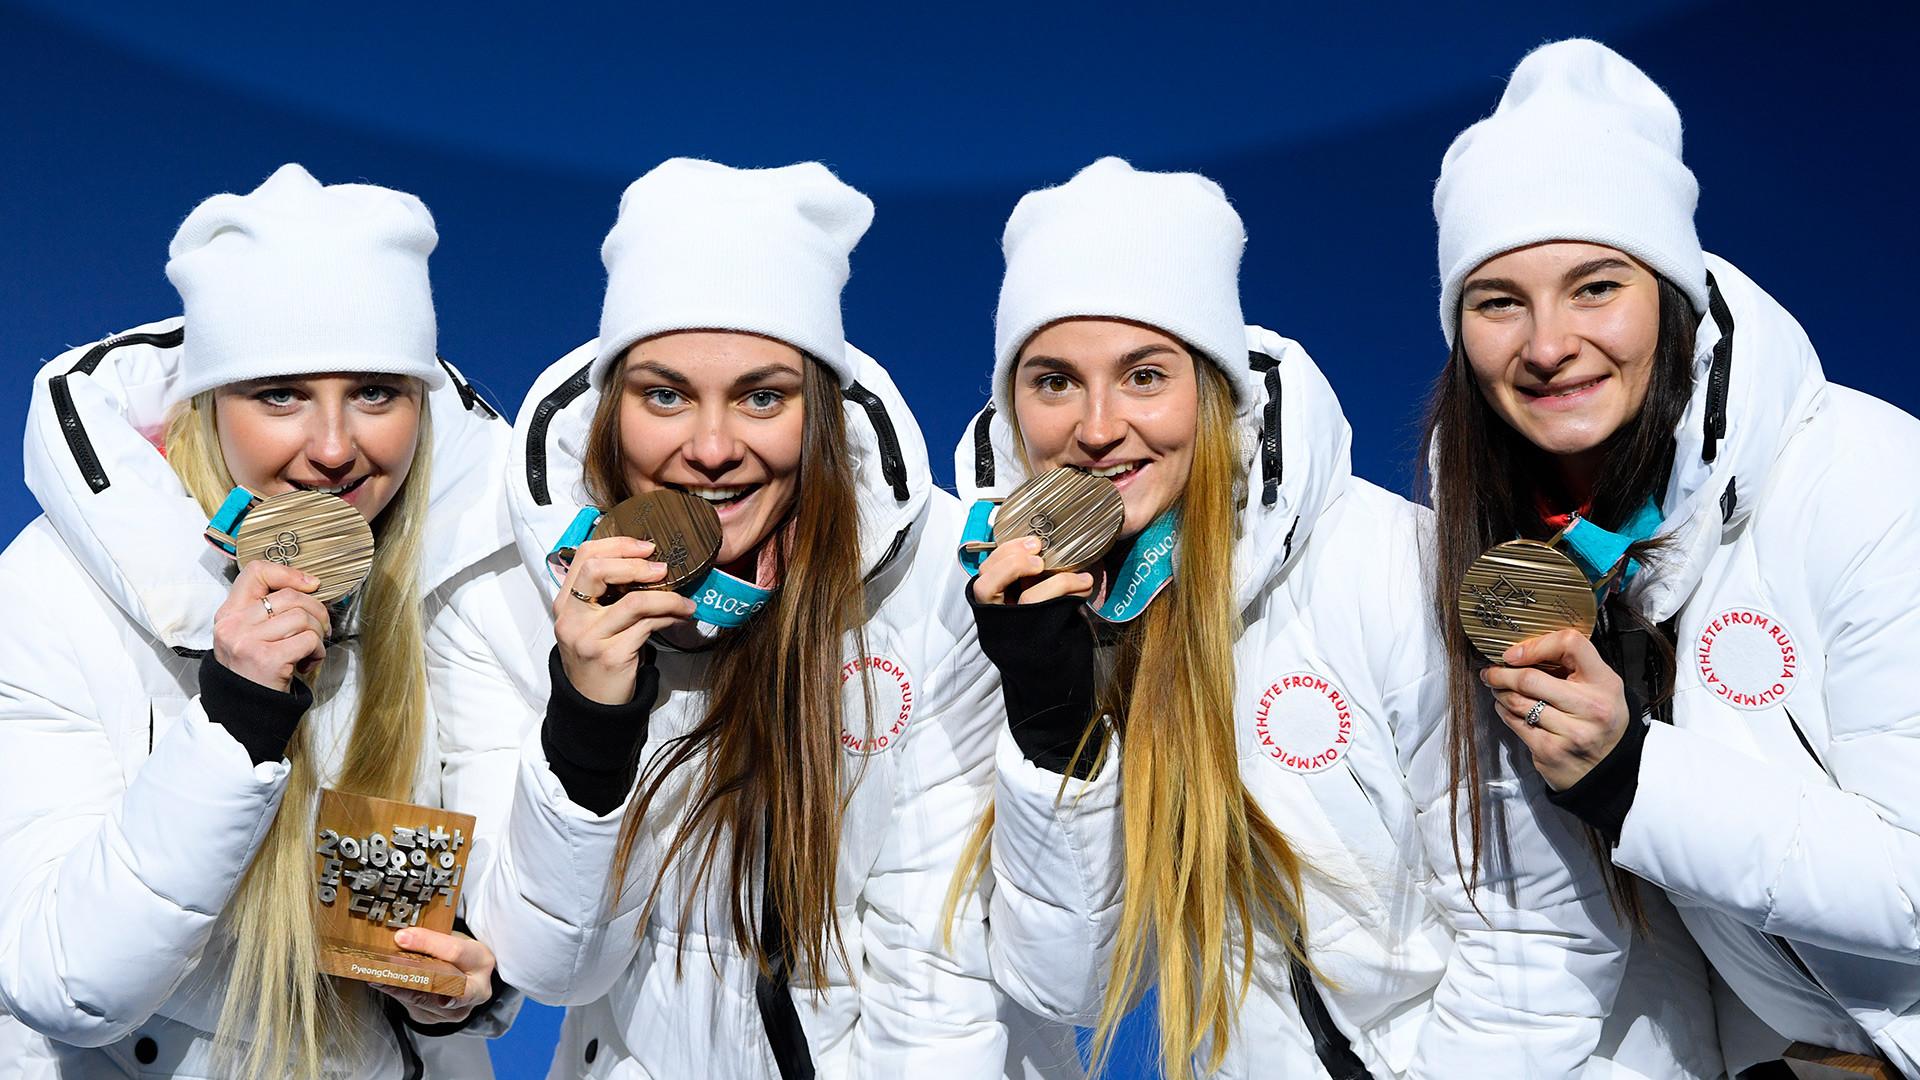 L-R: Natalia Nepryaeva, Yulia Belorukova, Anastasia Sedova, Anna Nechaevskaya